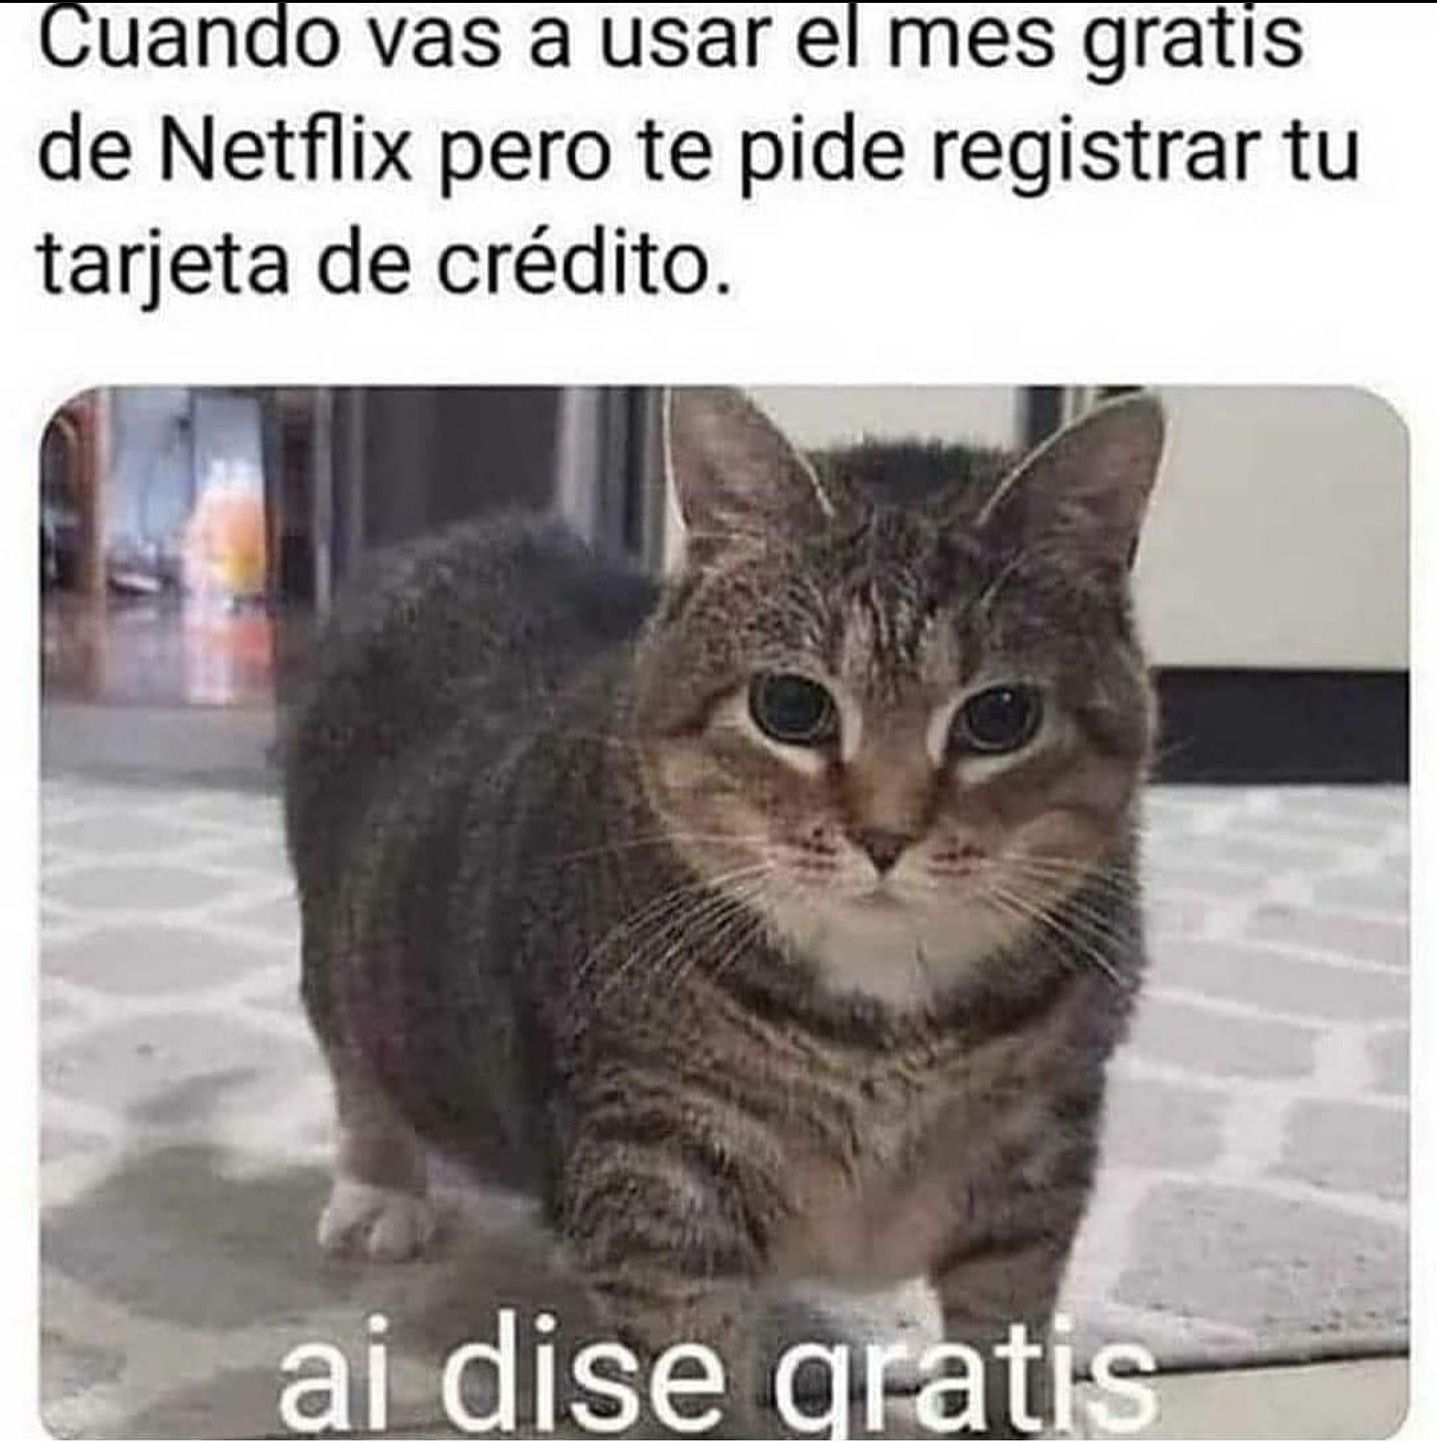 Mejores Memes Memes En Espanol Memes Meme Meme Del Dia Memes 2020 Dice Gratis Meme Divertido Meme Gracioso Memes